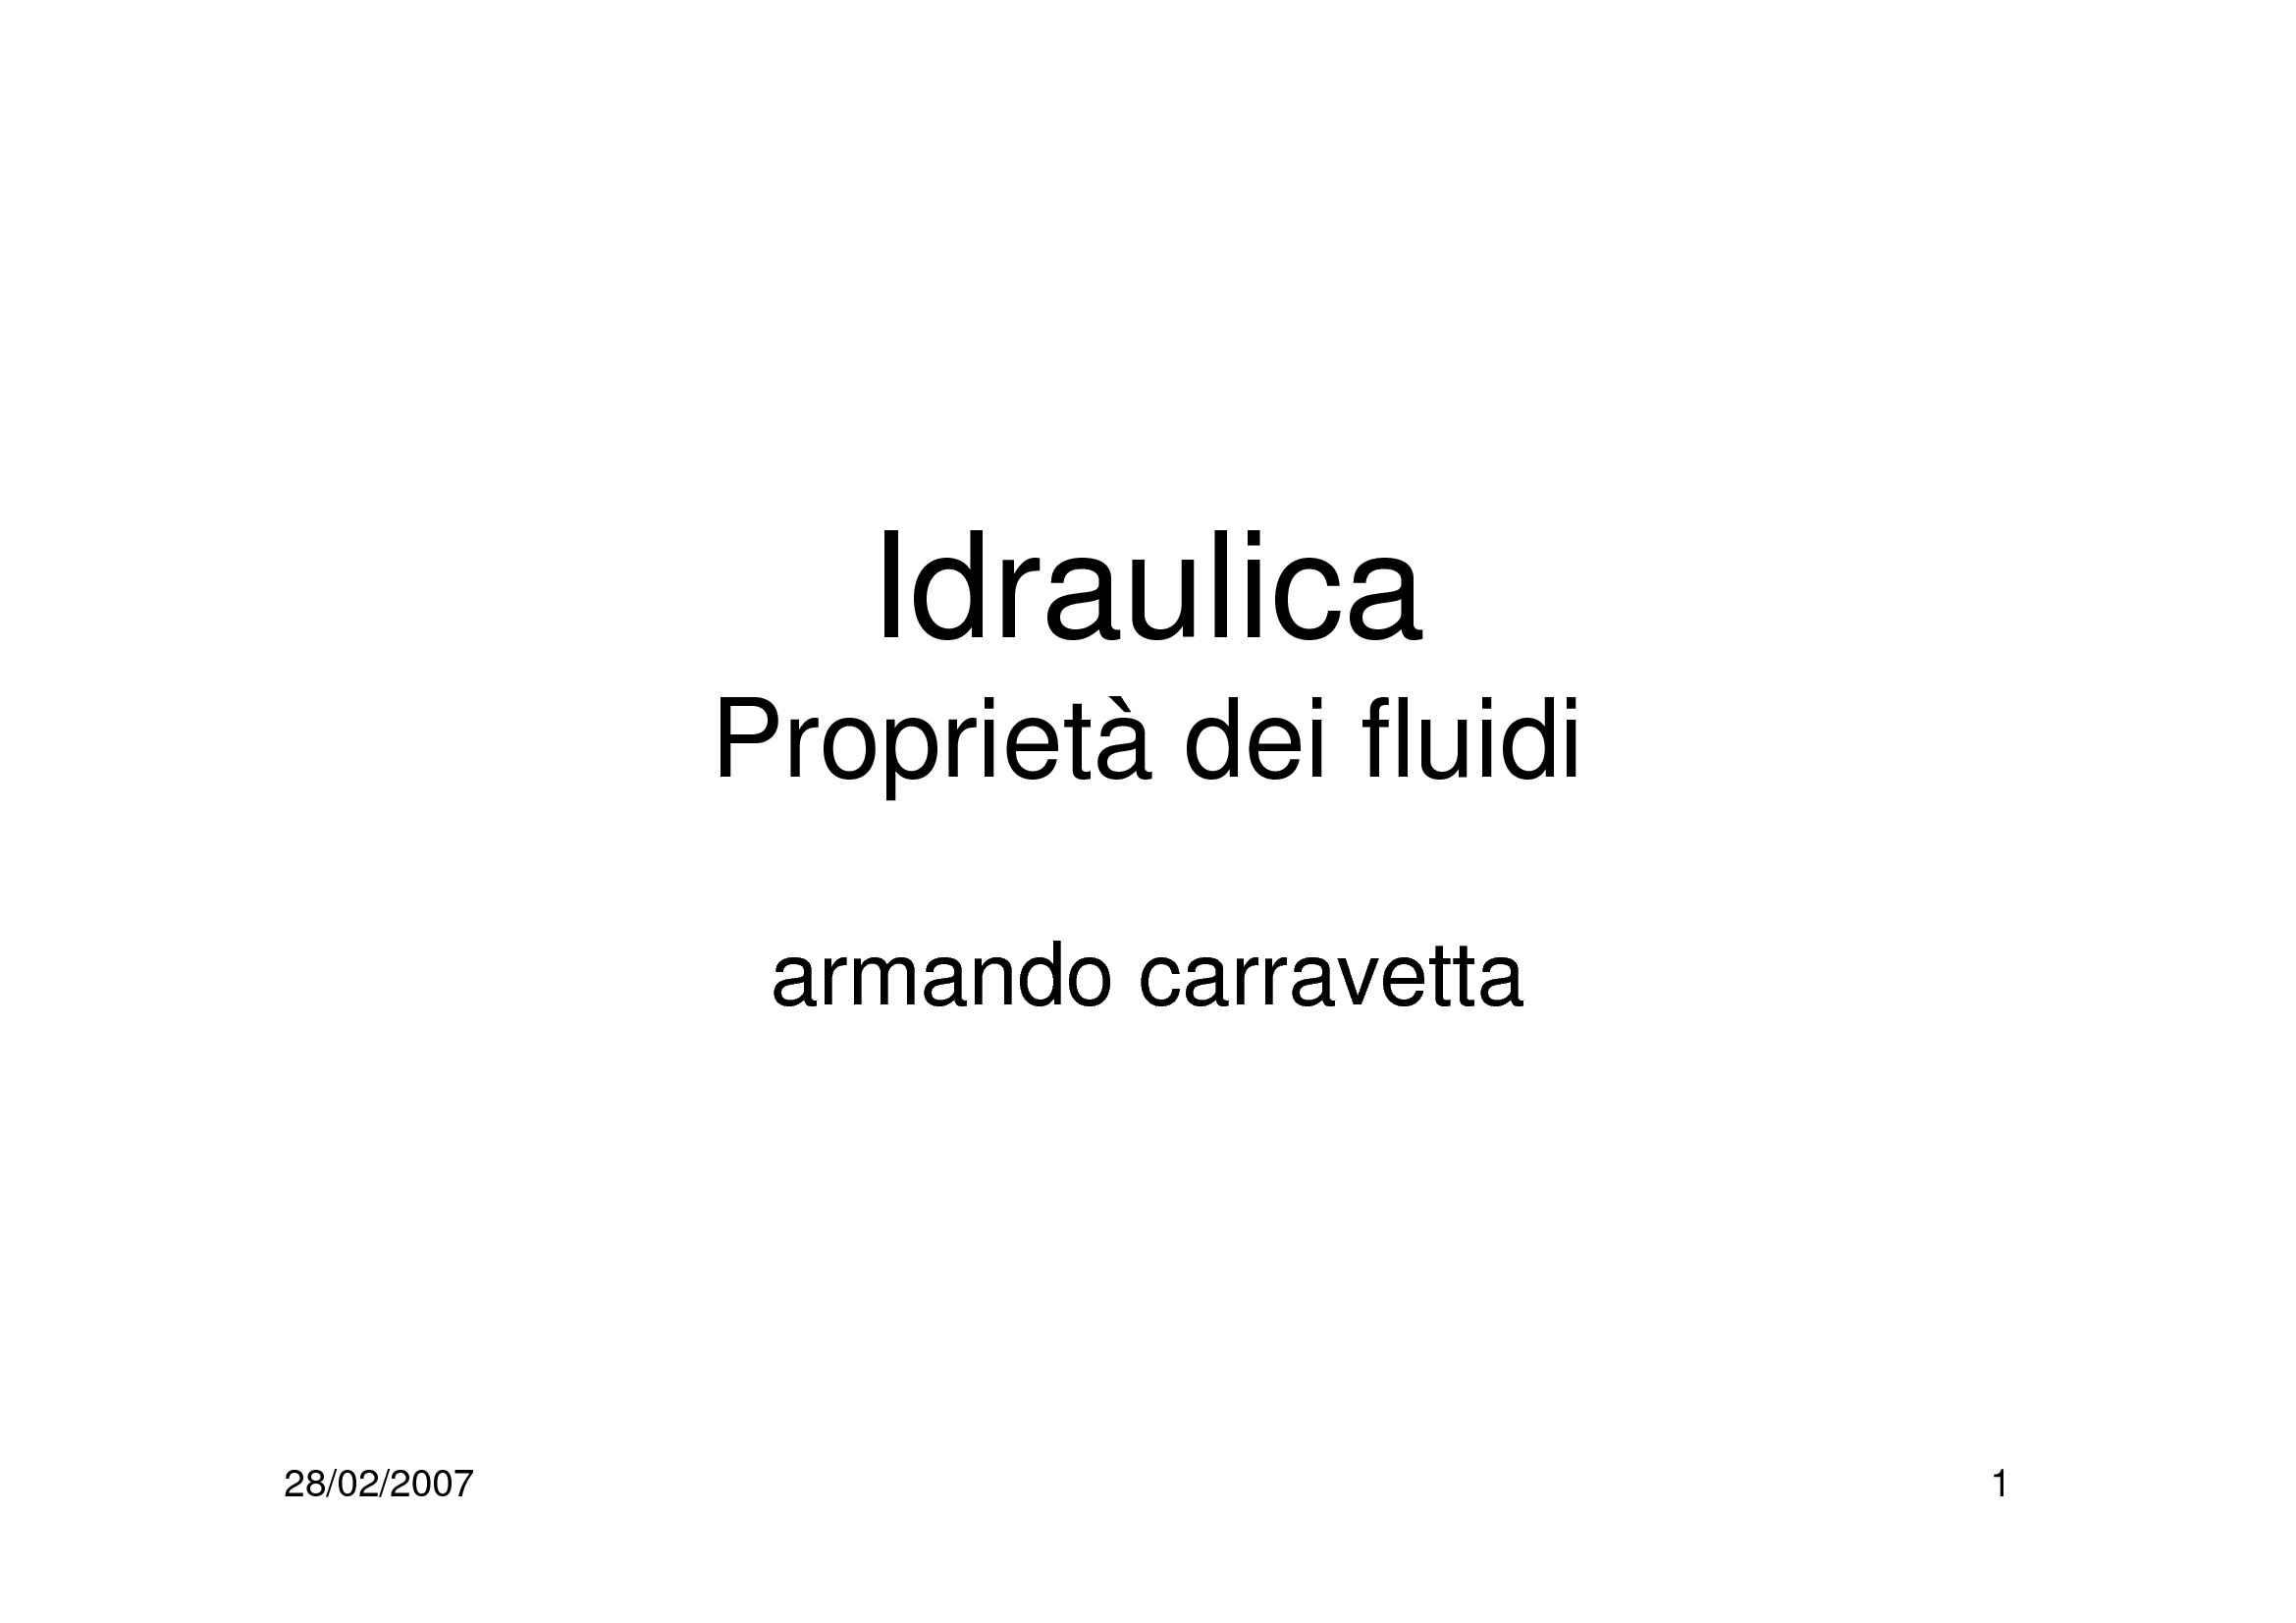 Fluidi - Proprietà